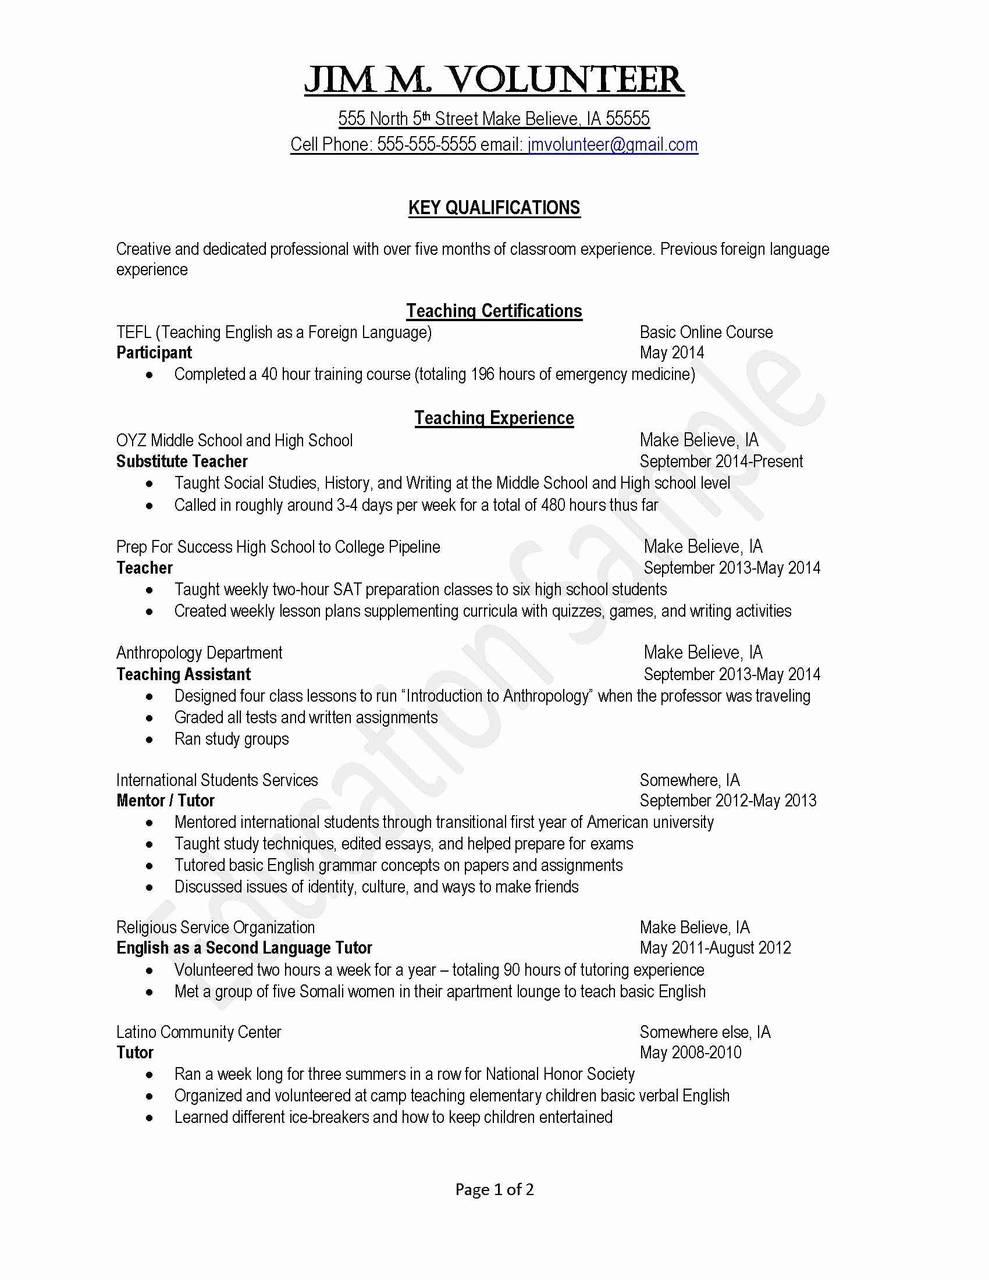 007 Private Tutor Resume Sample On College Essay Long Island